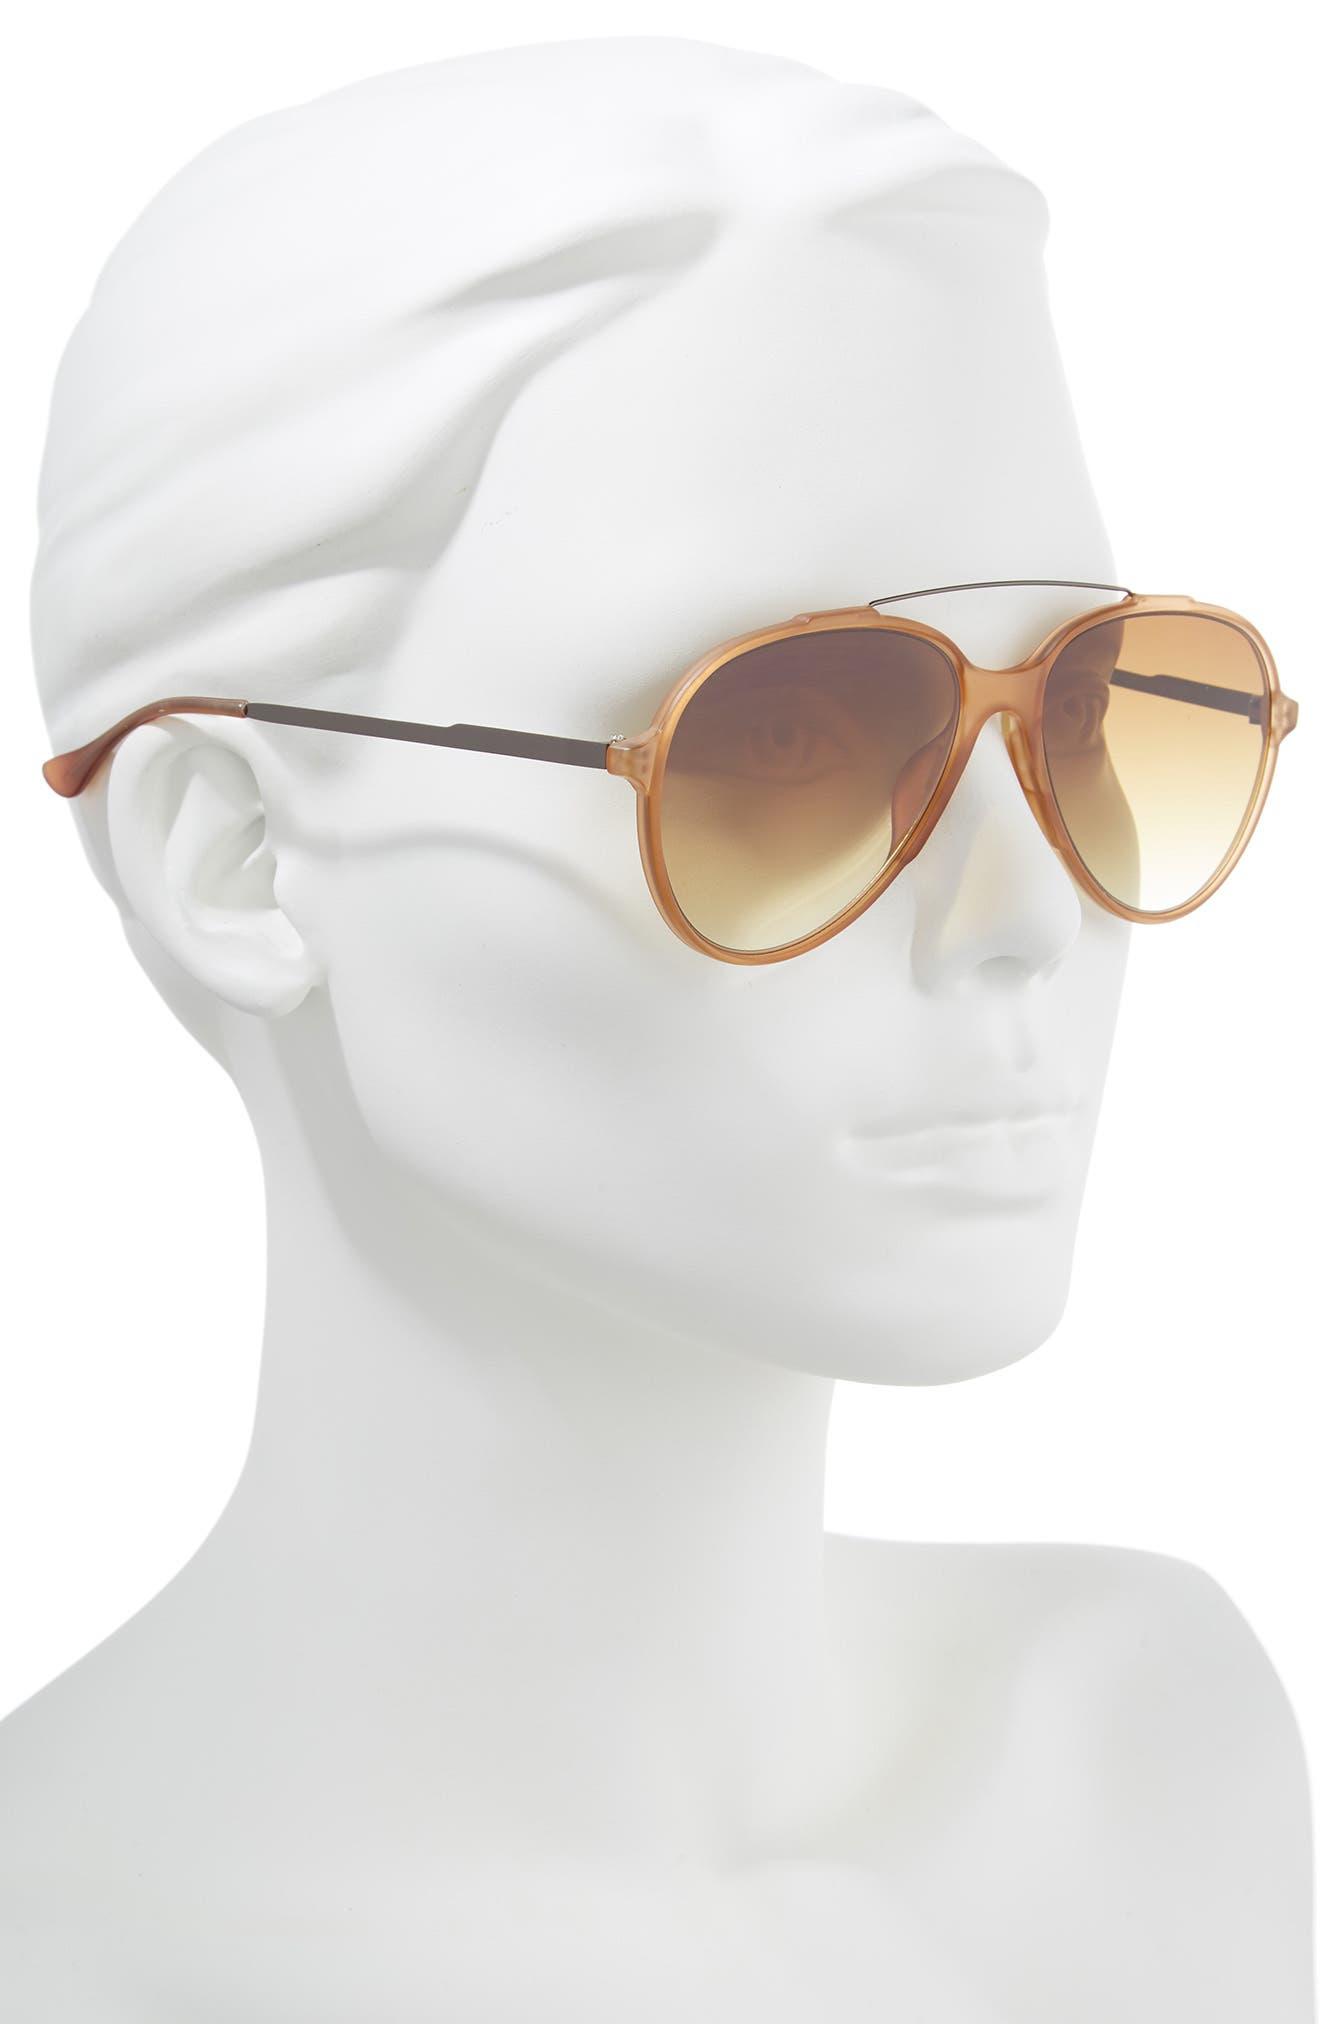 55mm Aviator Sunglasses,                             Alternate thumbnail 2, color,                             BROWN